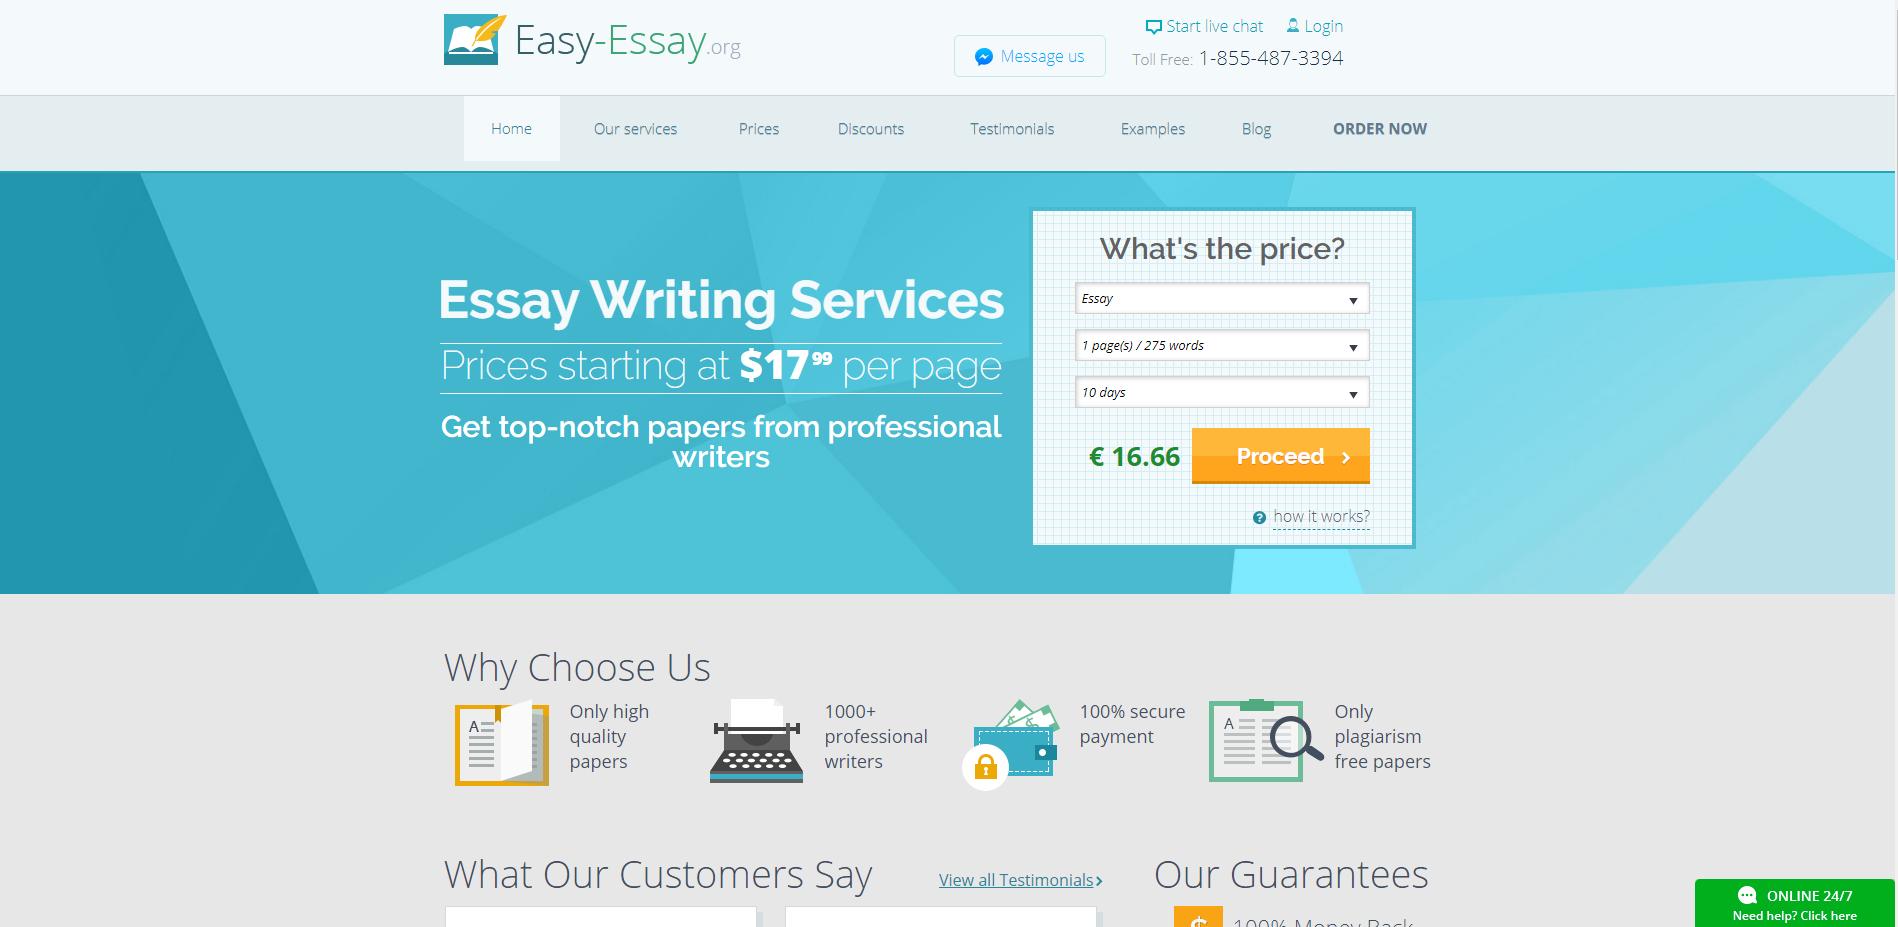 Easy-Essay.org